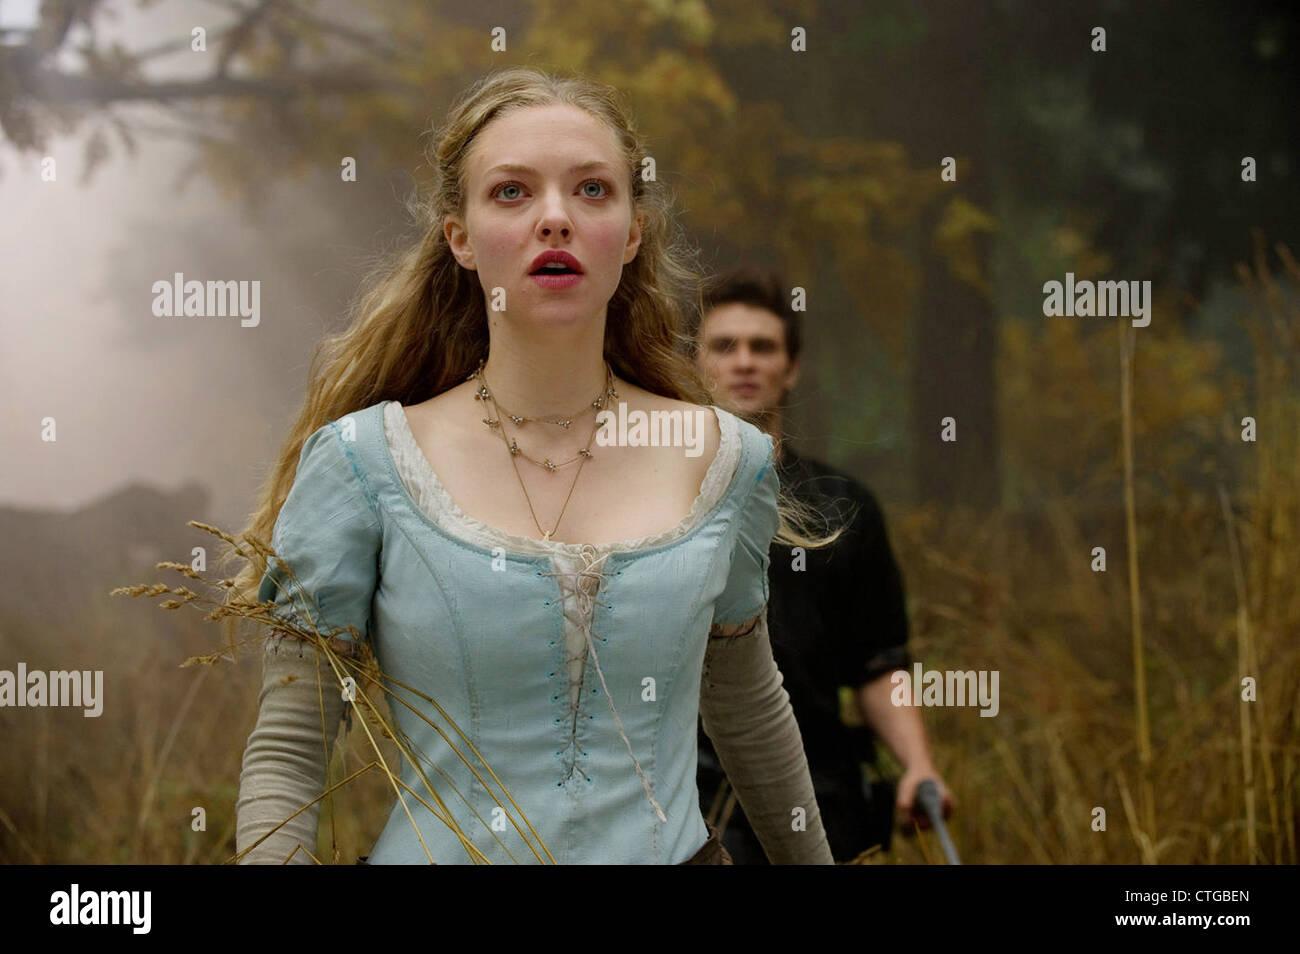 RED RIDING HOOD (2011) AMANDA SEYFRIED, SHILOH FERNANDEZ CATHERINE HARDWICKE (DIR) 006 MOVIESTORE COLLECTION LTD - Stock Image